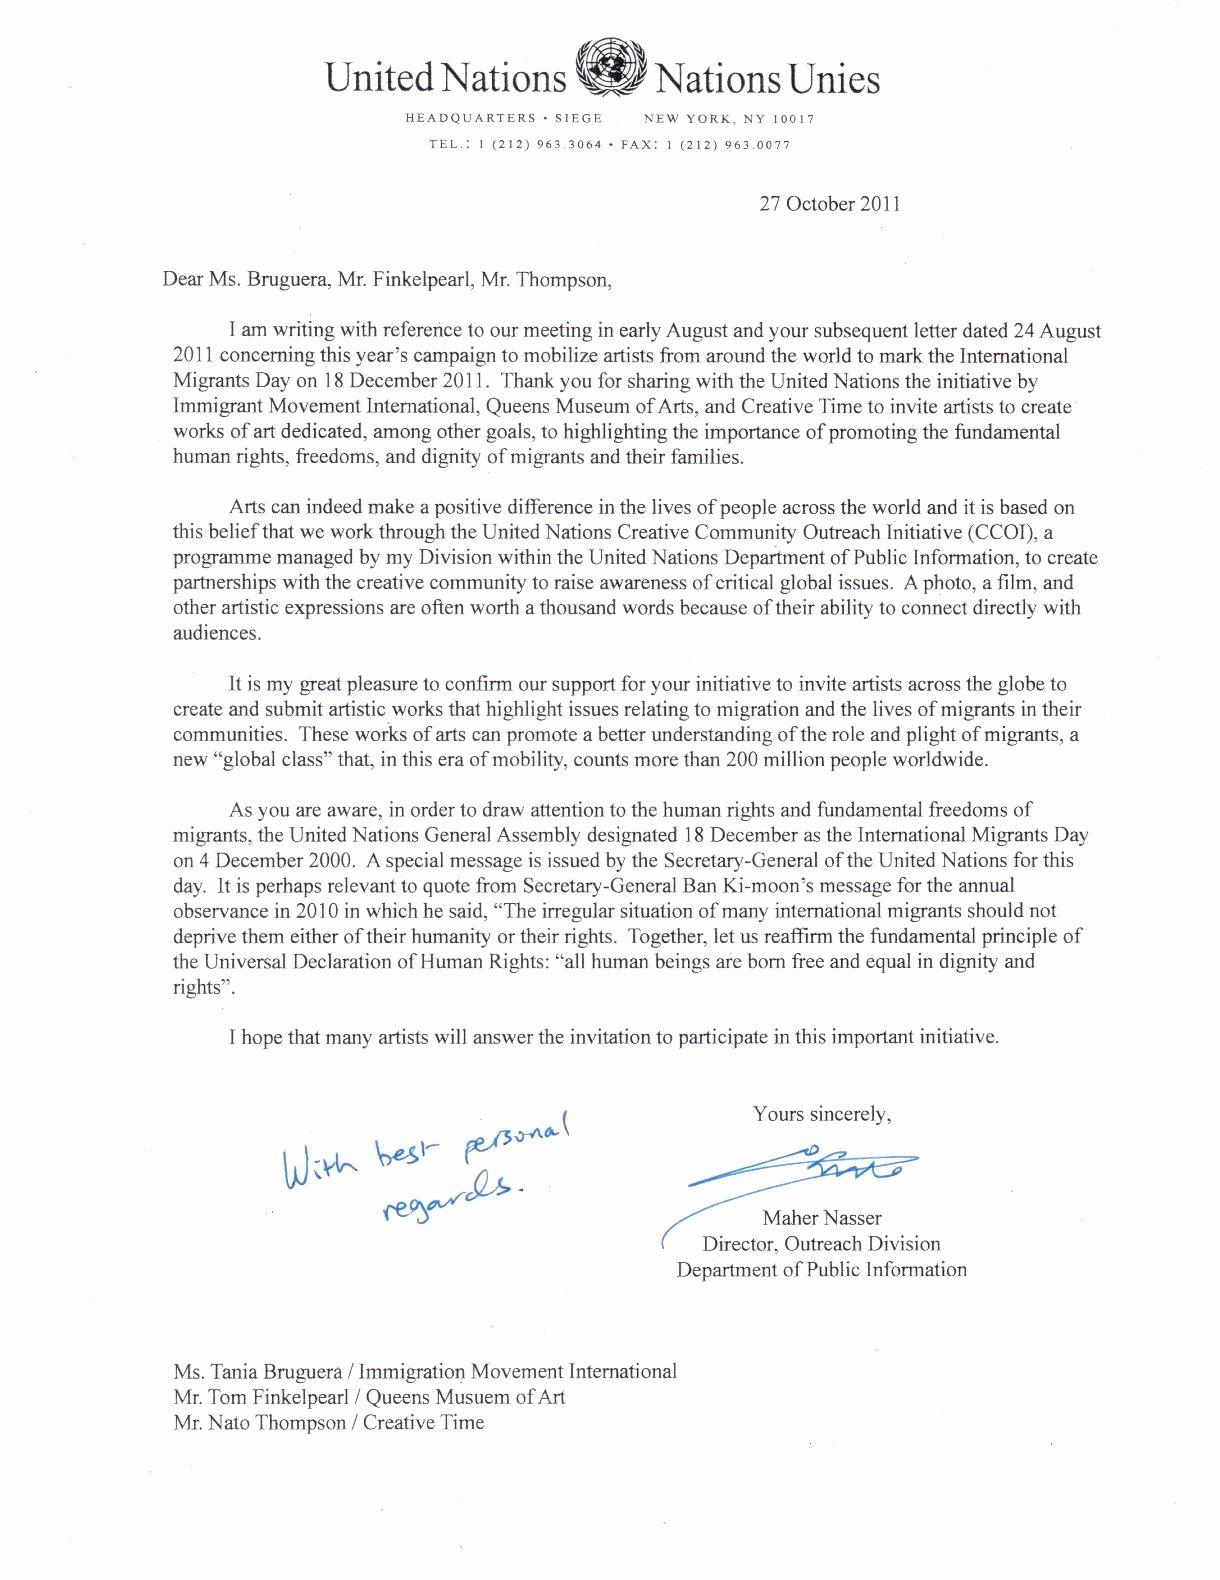 Sample Immigration Letter Of Support Elegant United Nations Ficial Letter Support for Dec